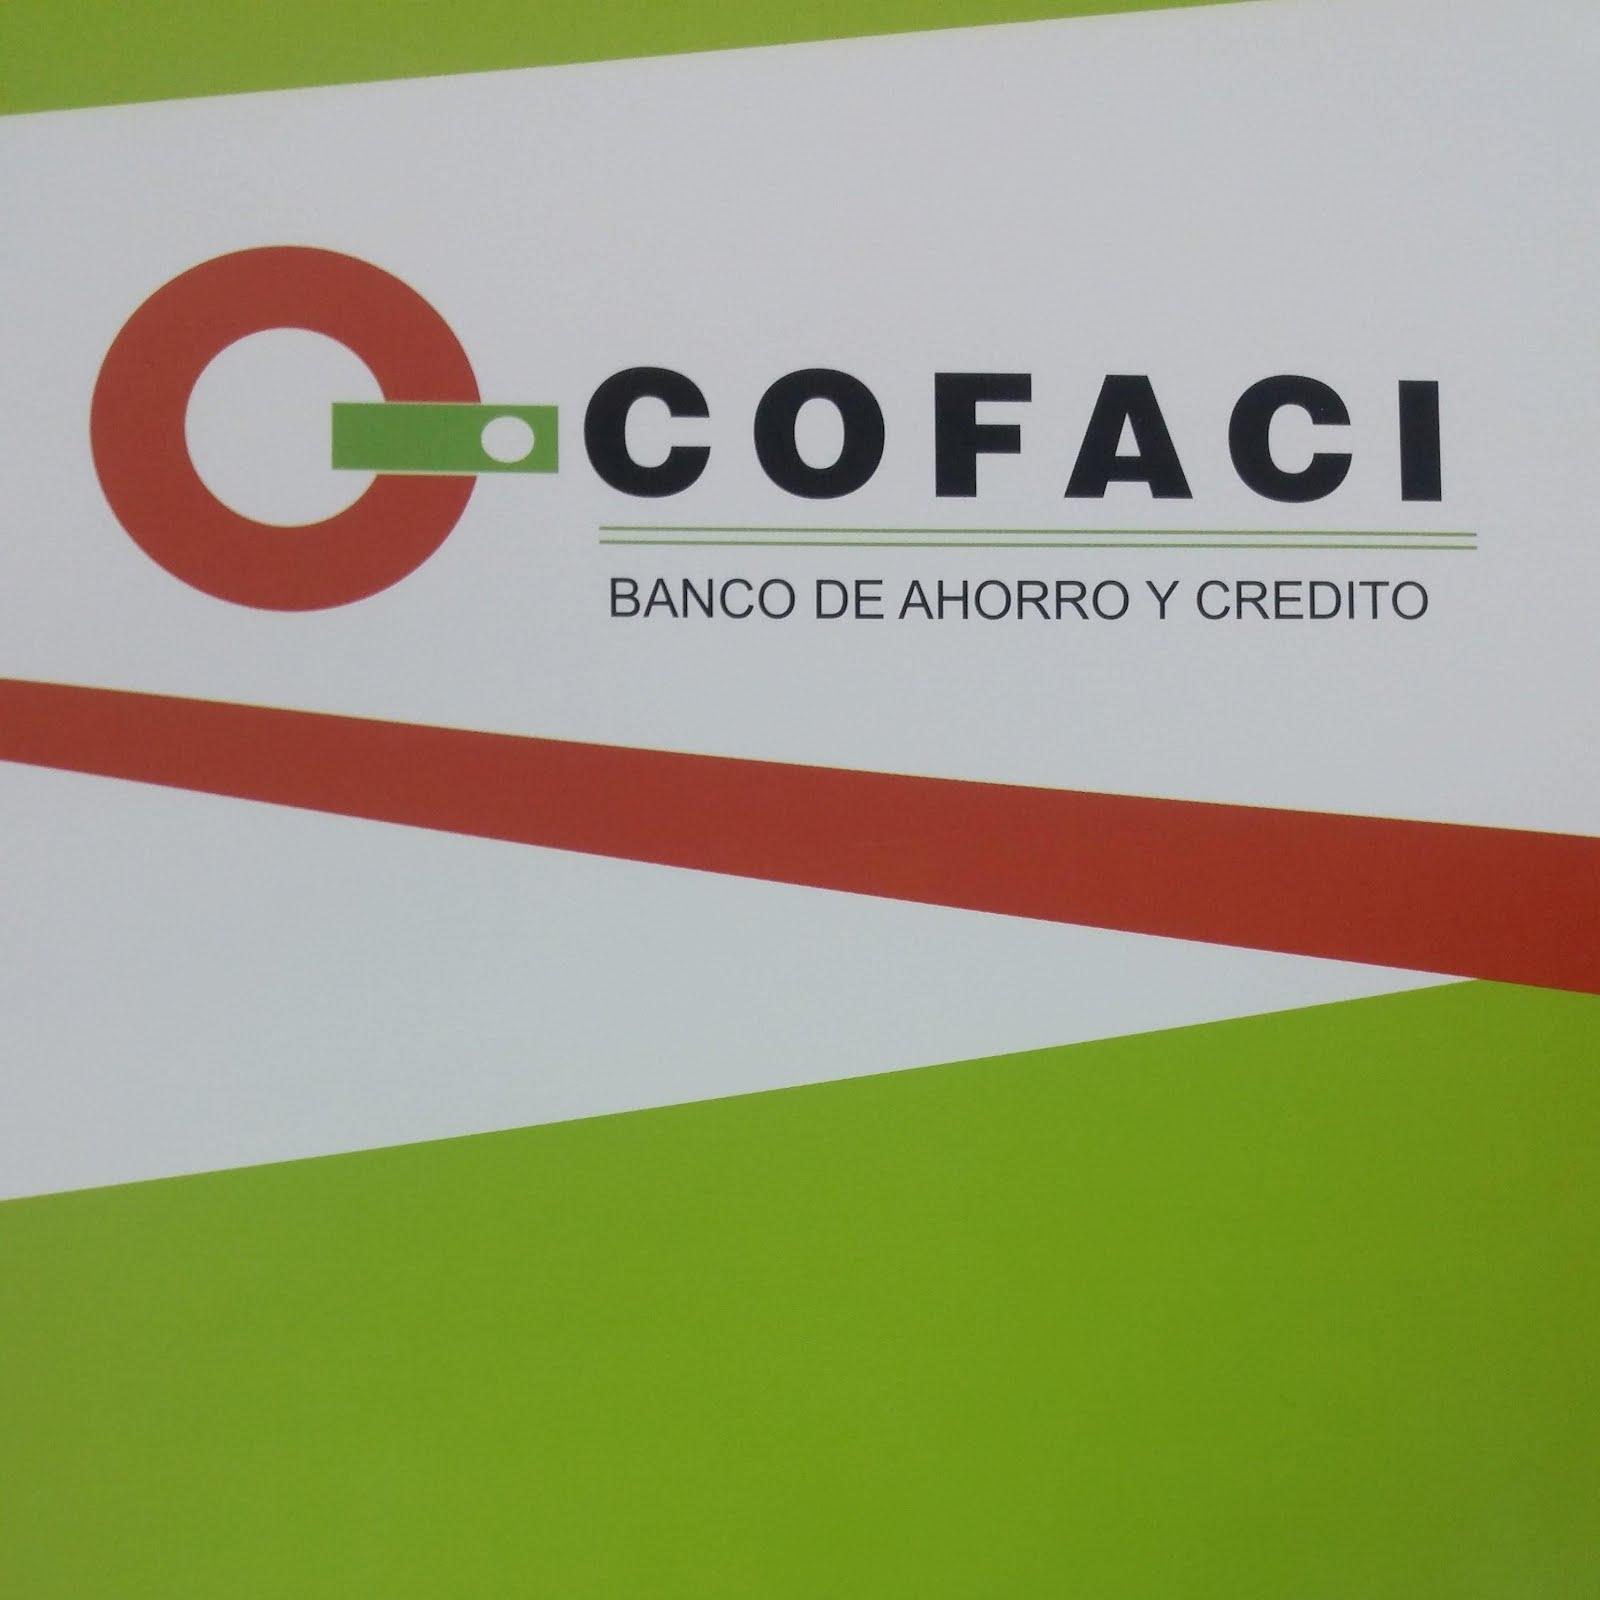 BANCO COFACI